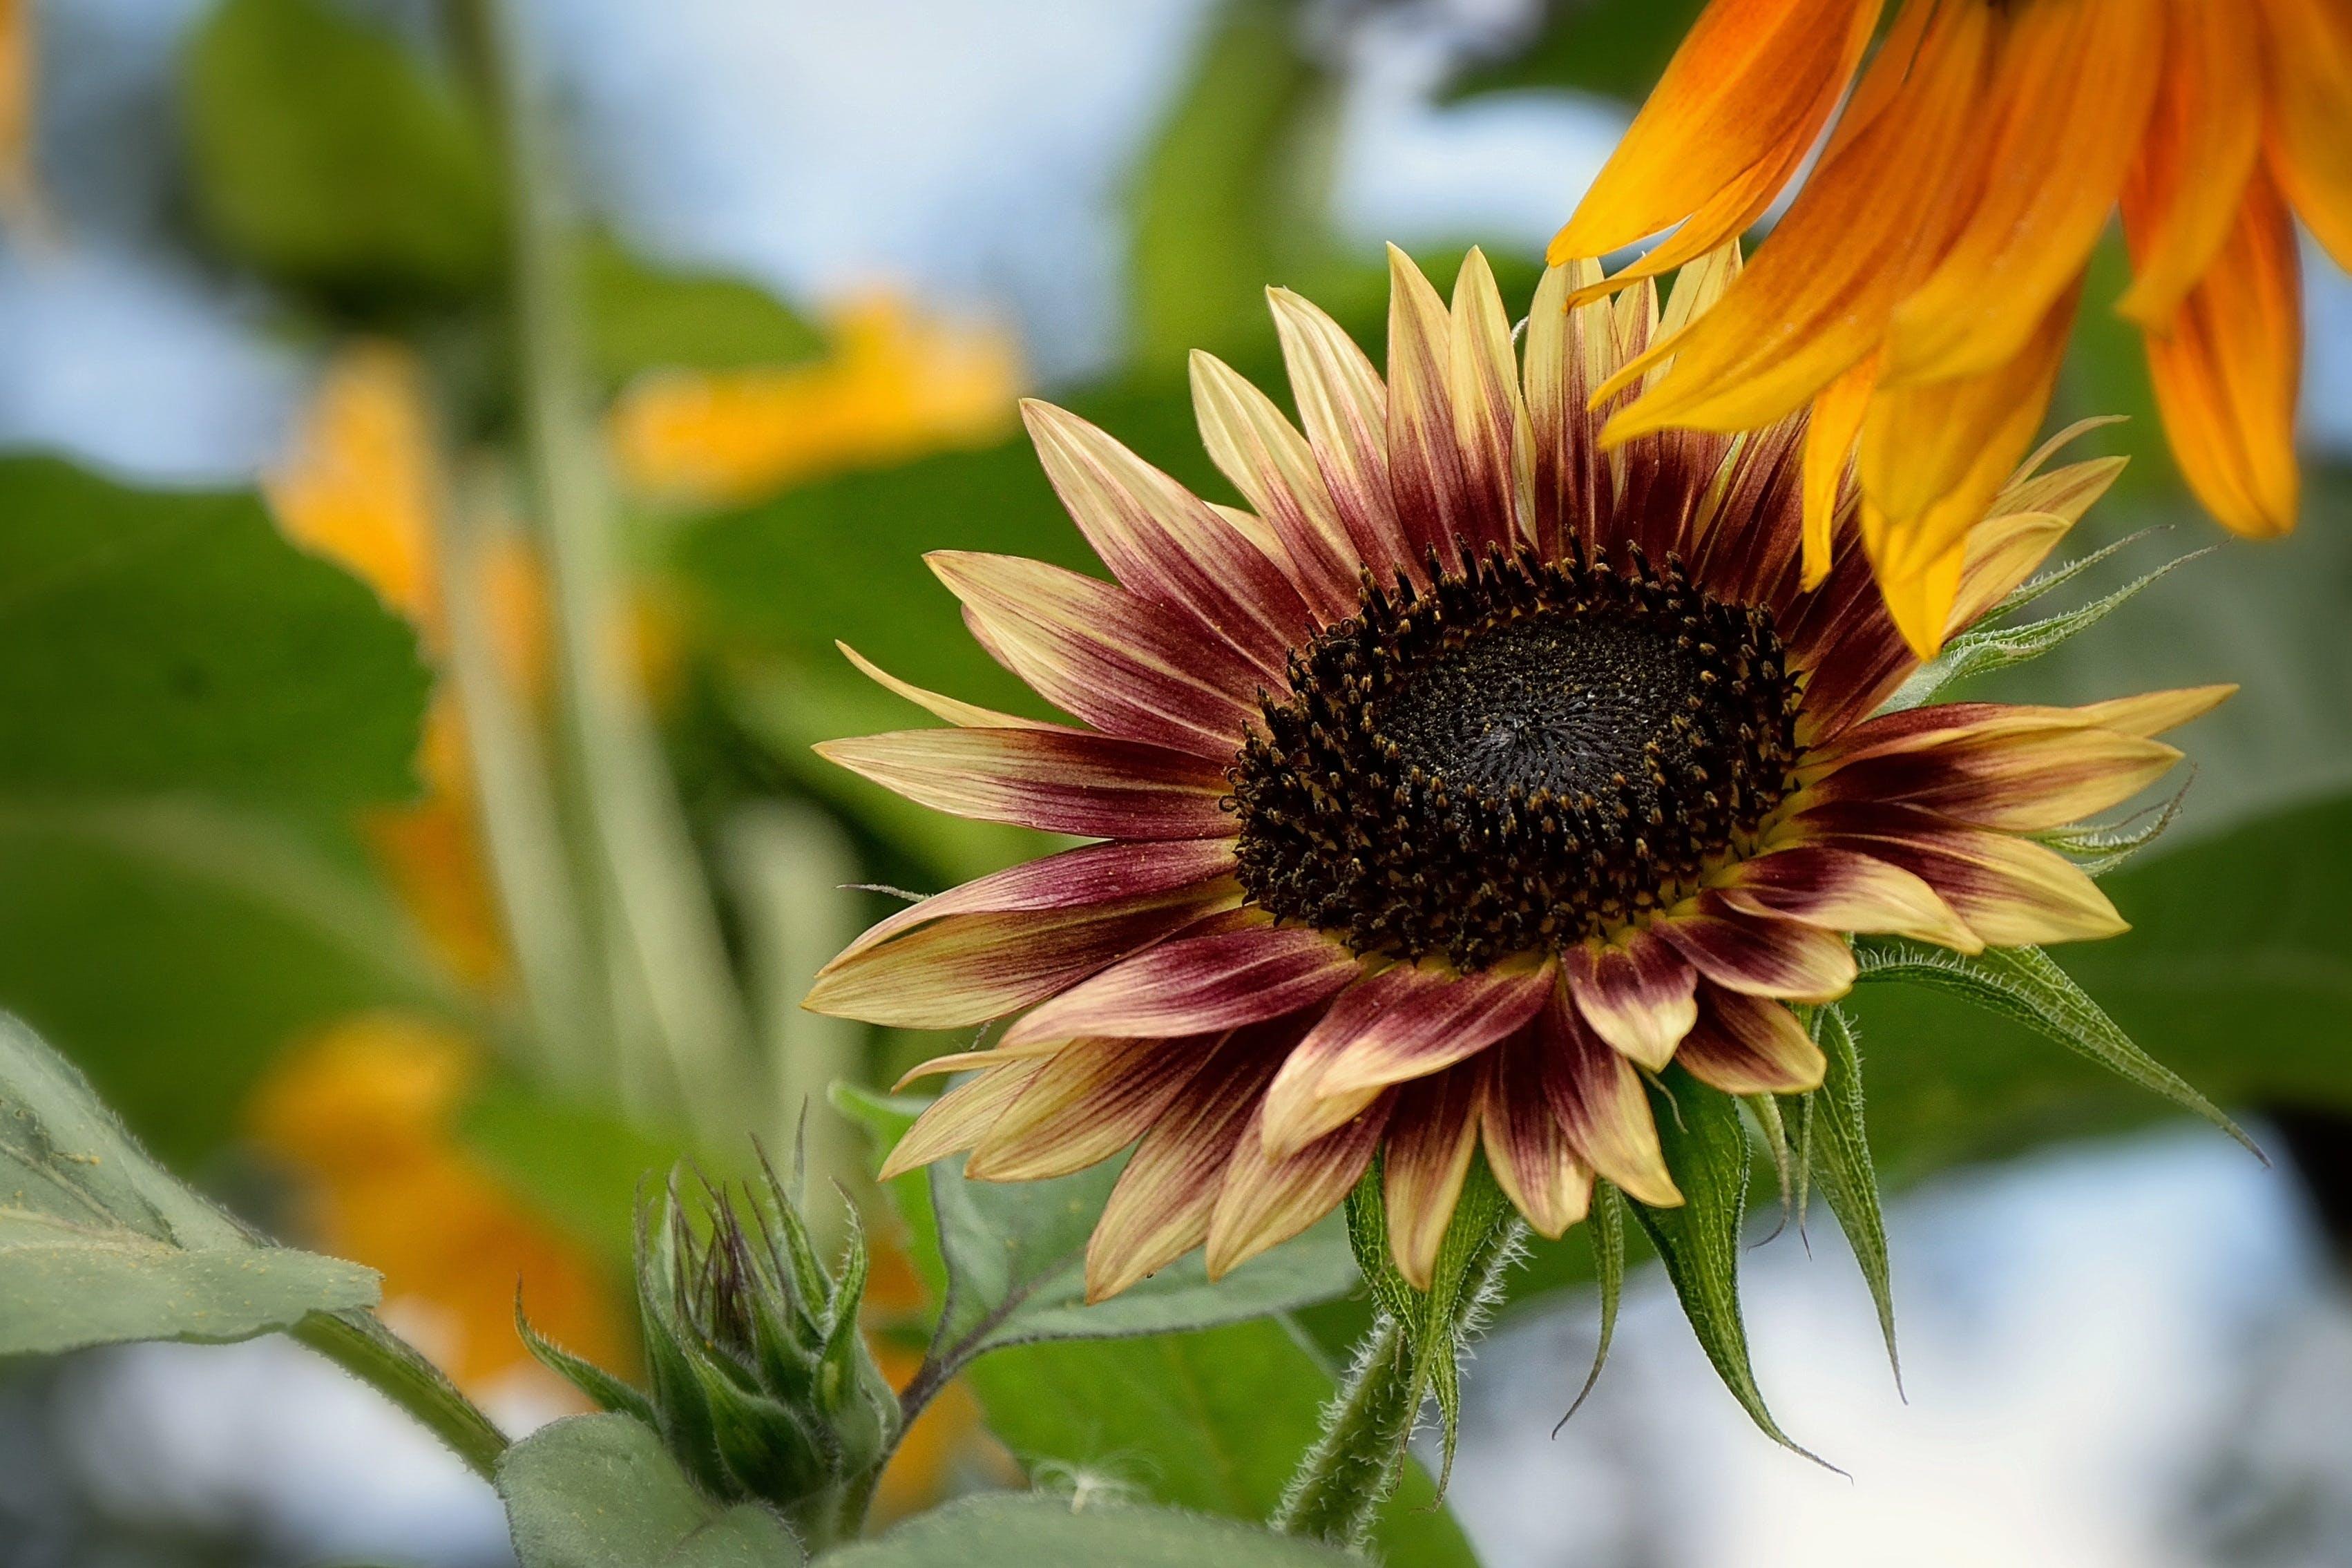 Free stock photo of summer, sun, garden, yellow